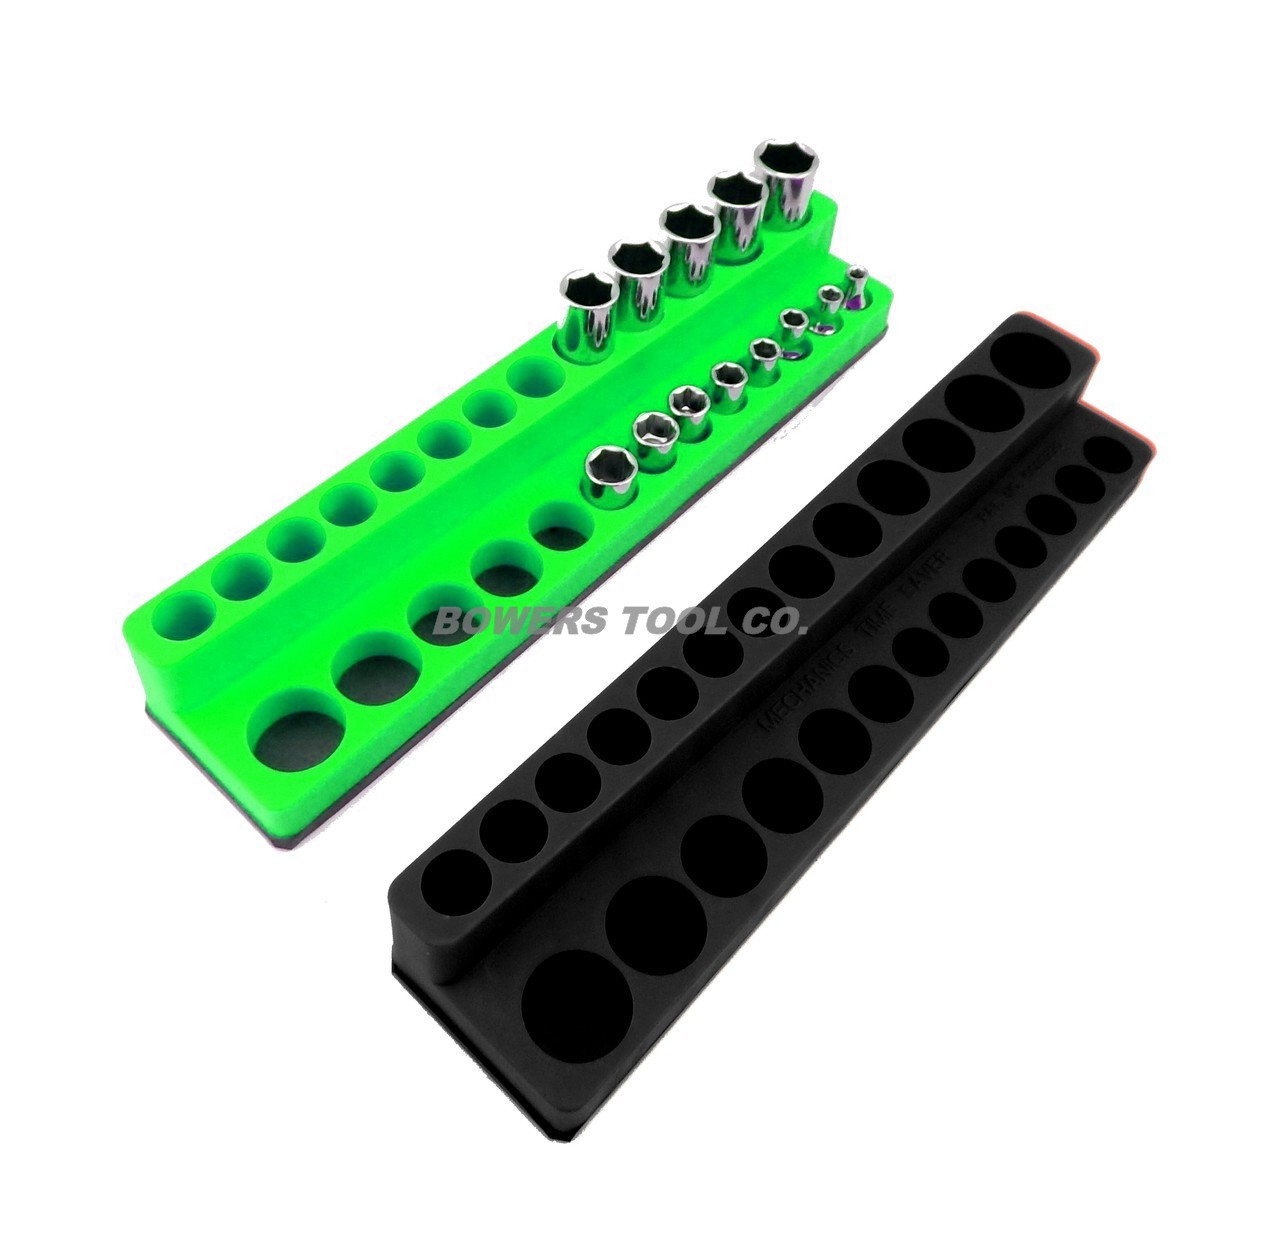 Mechanics Time Saver 1//4 Drive Magnetic Socket Holder Deep Organizer MTS Green